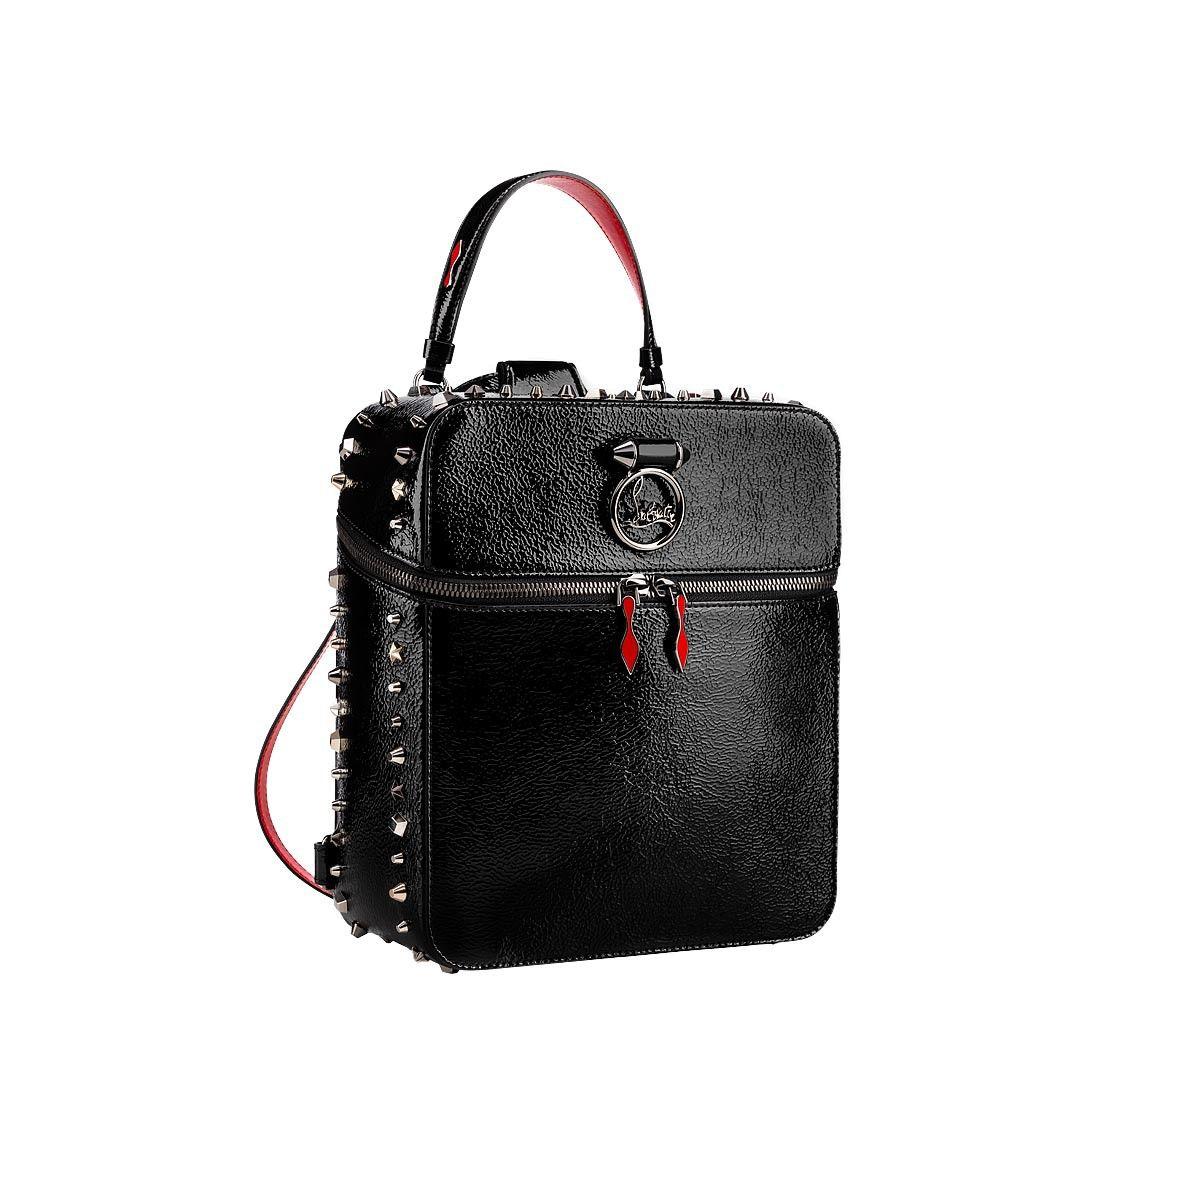 988c2f25e1c Bags - Rubylou Backpack - Christian Louboutin | Bag 'em | Bags ...